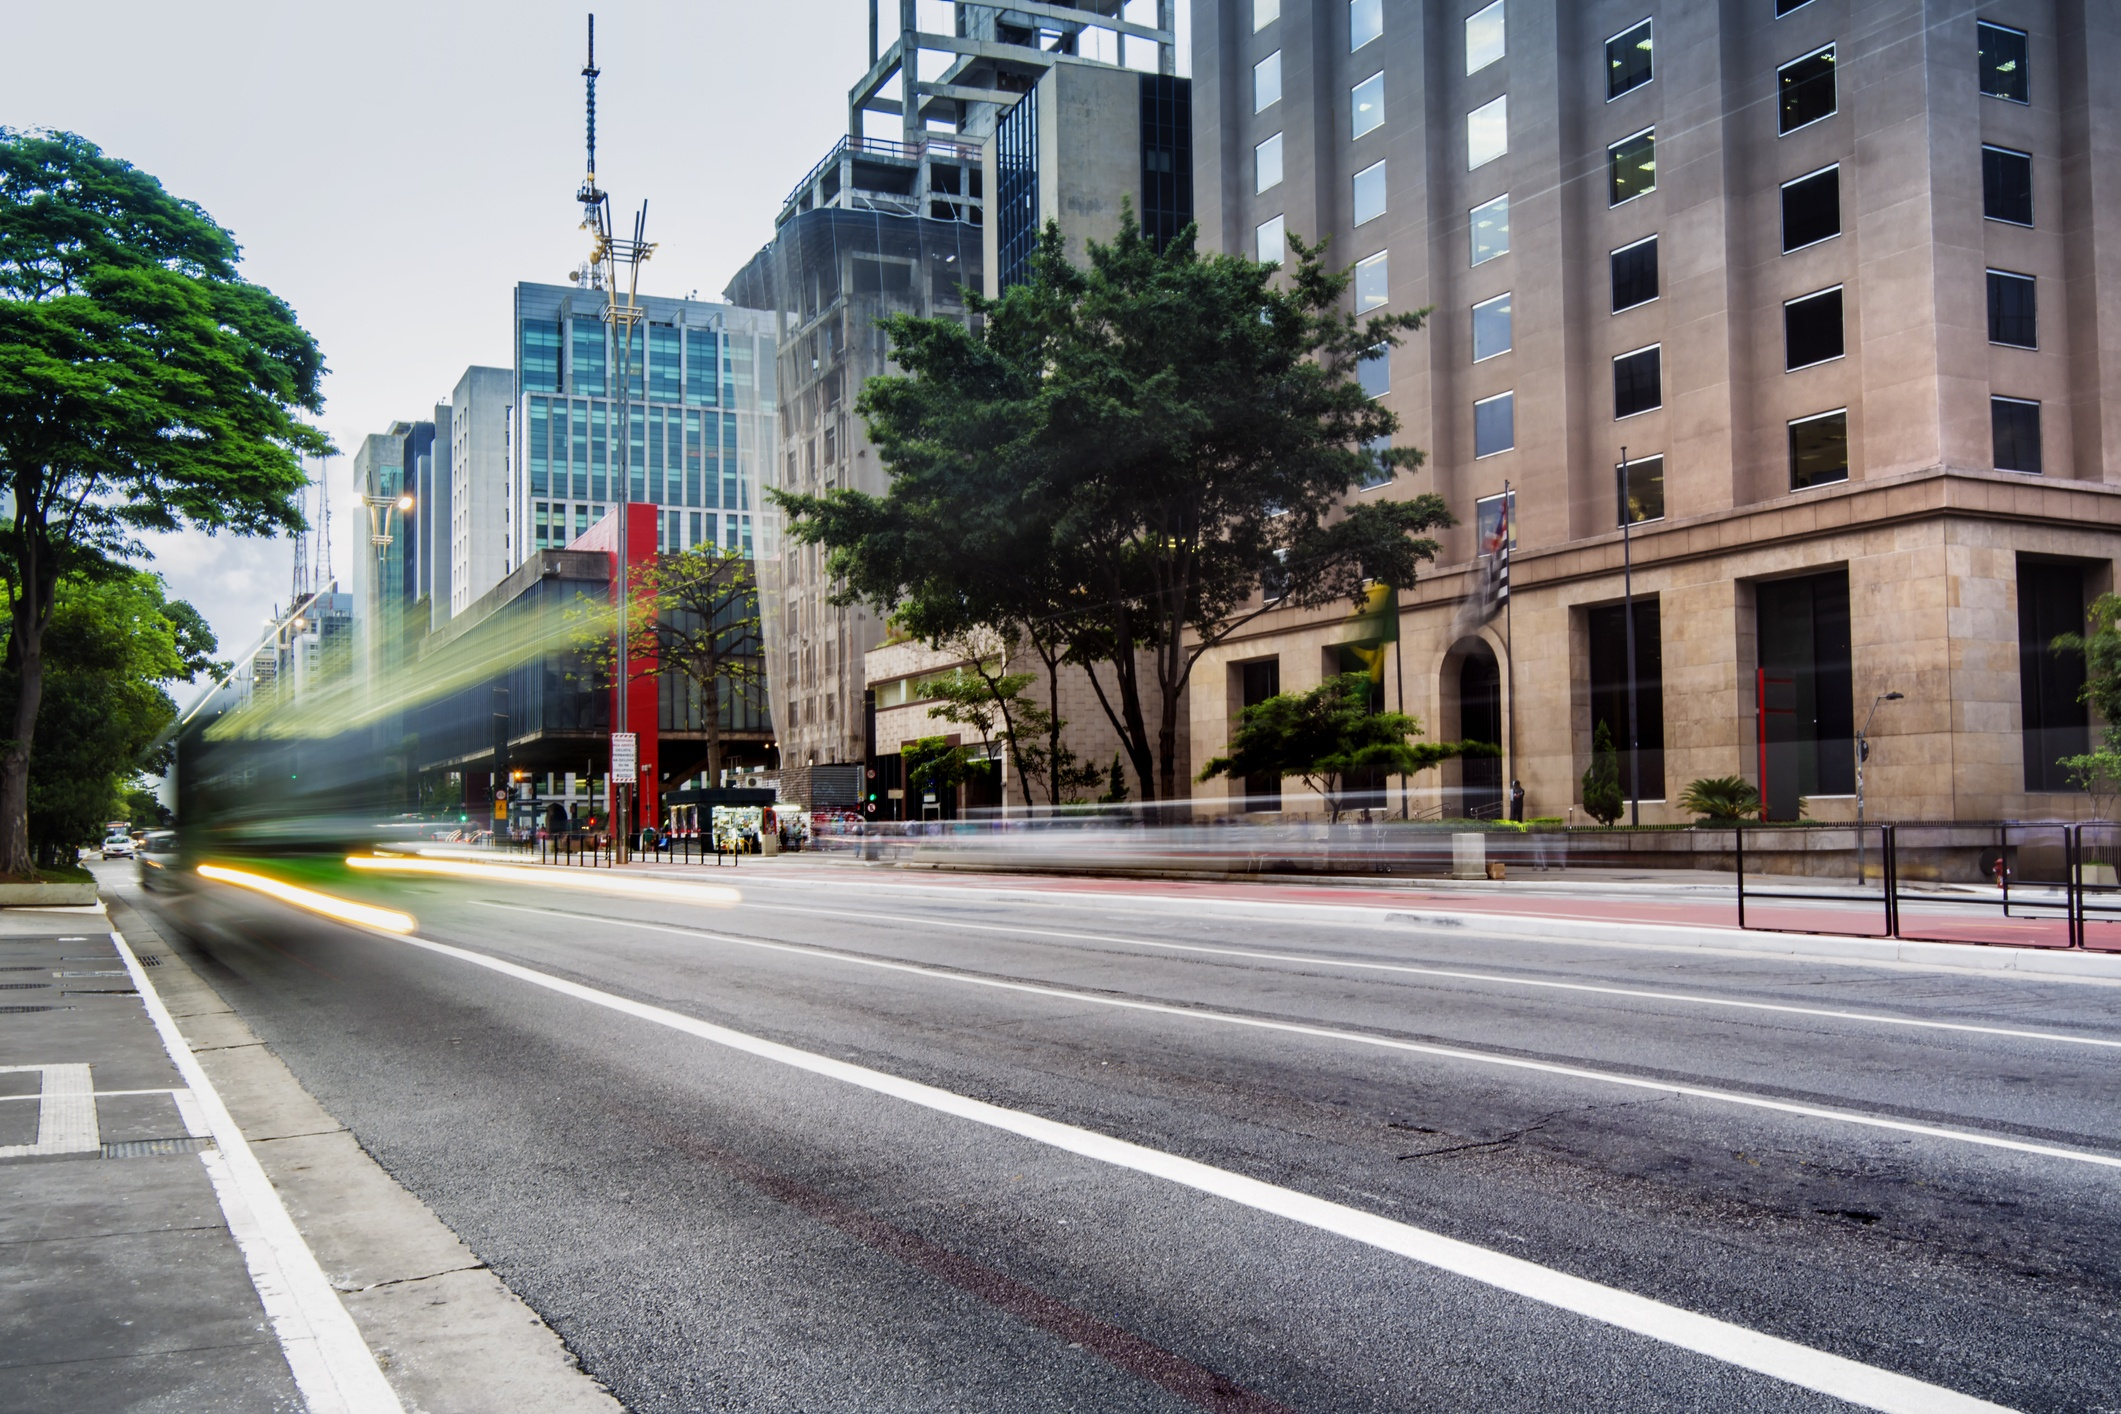 O que fazer na Avenida Paulista: descubra novos lugares